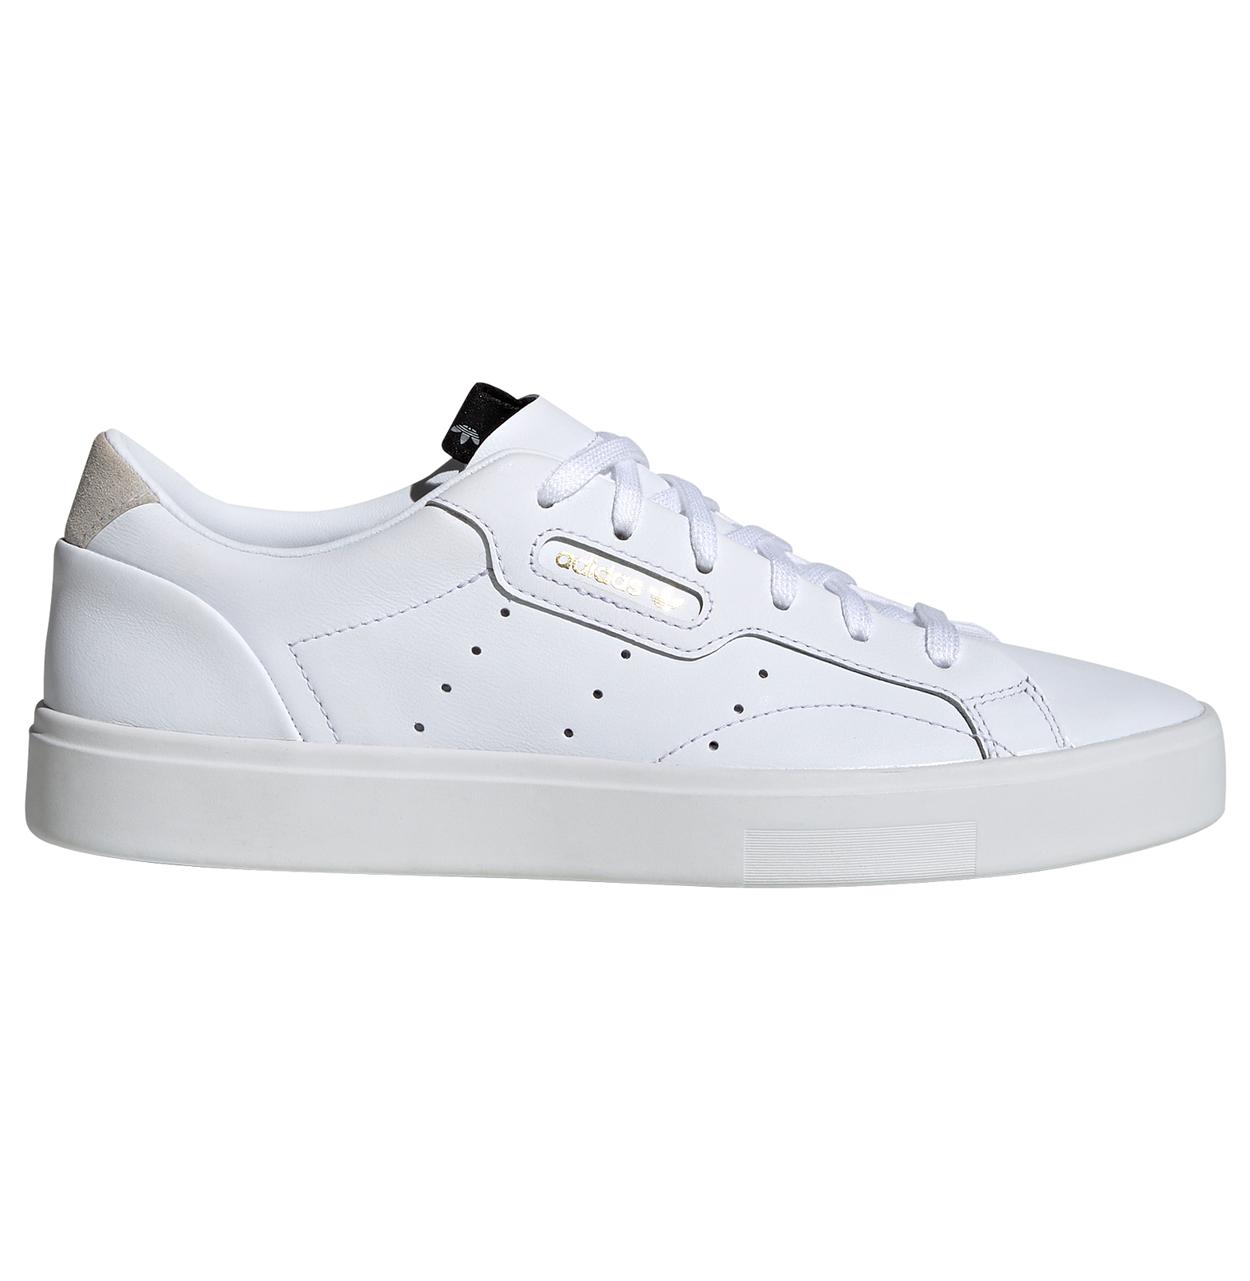 adidas Originals Sleek W Damen Sneaker weiß DB3258